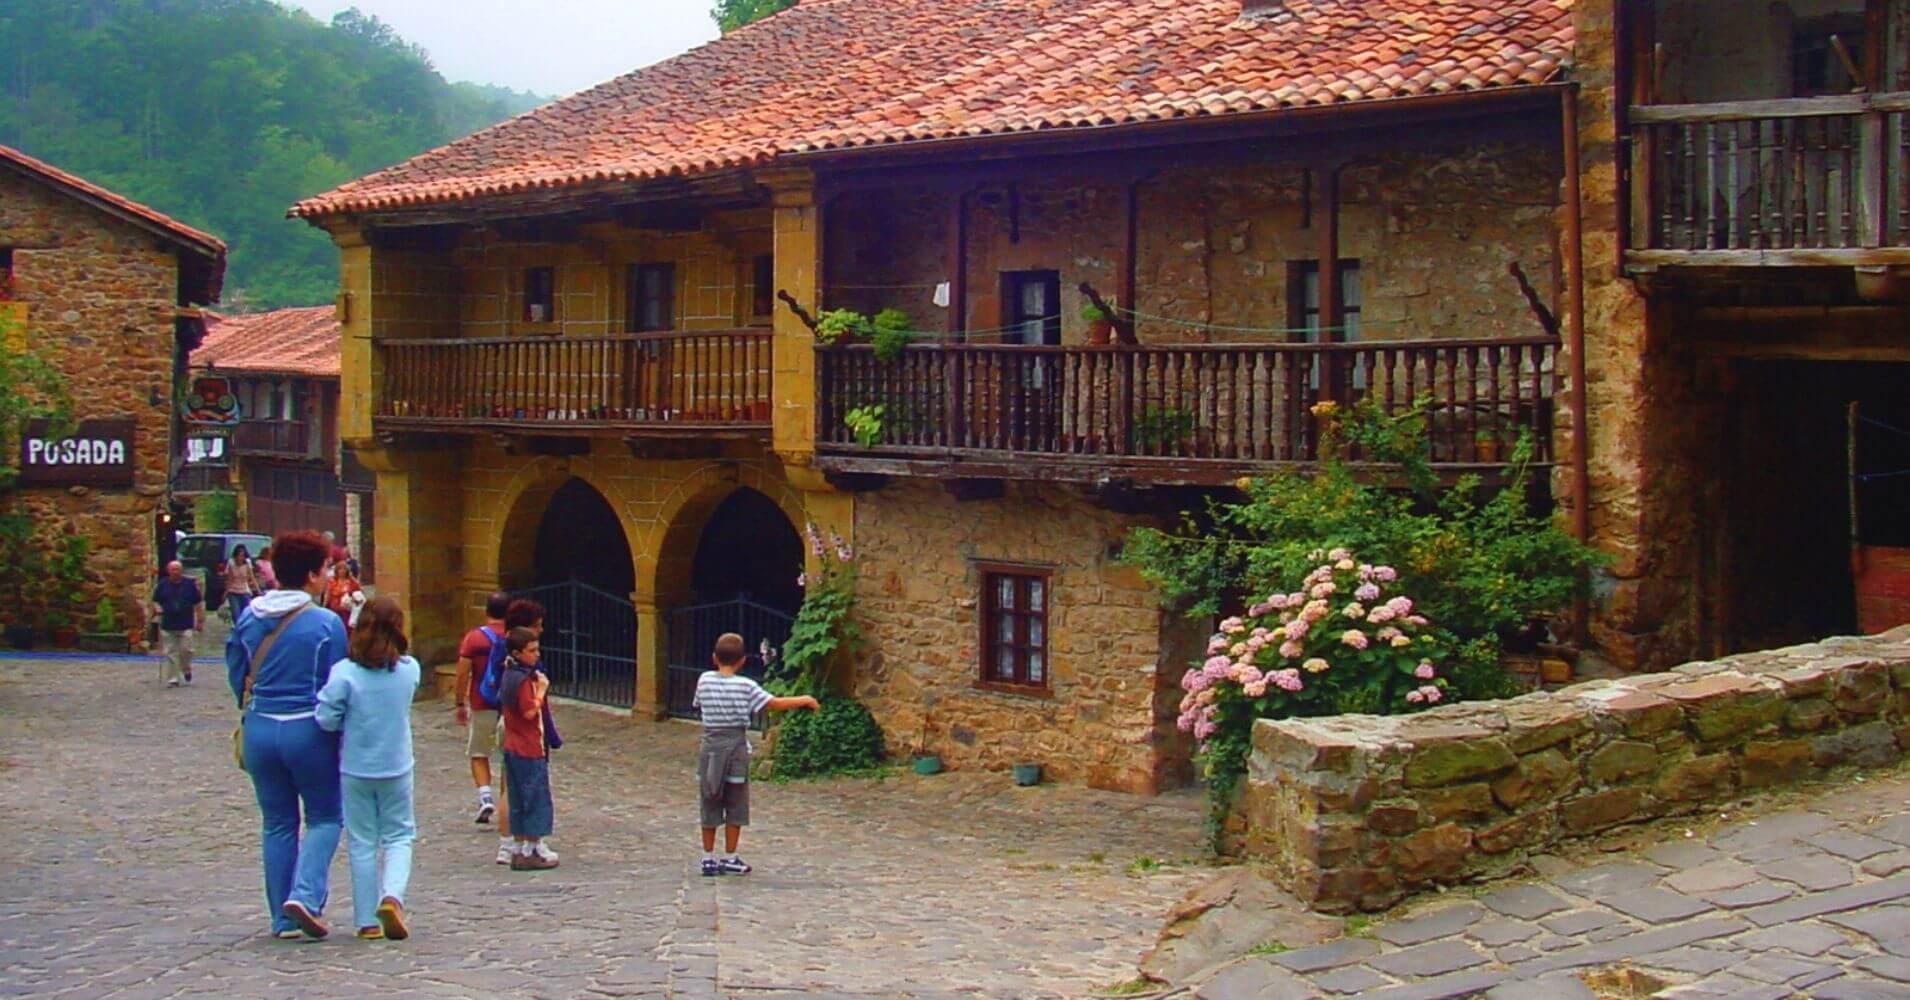 Viajar a Cantabria. Barcena Mayor, Los Tojos. Saja, Cantabria.